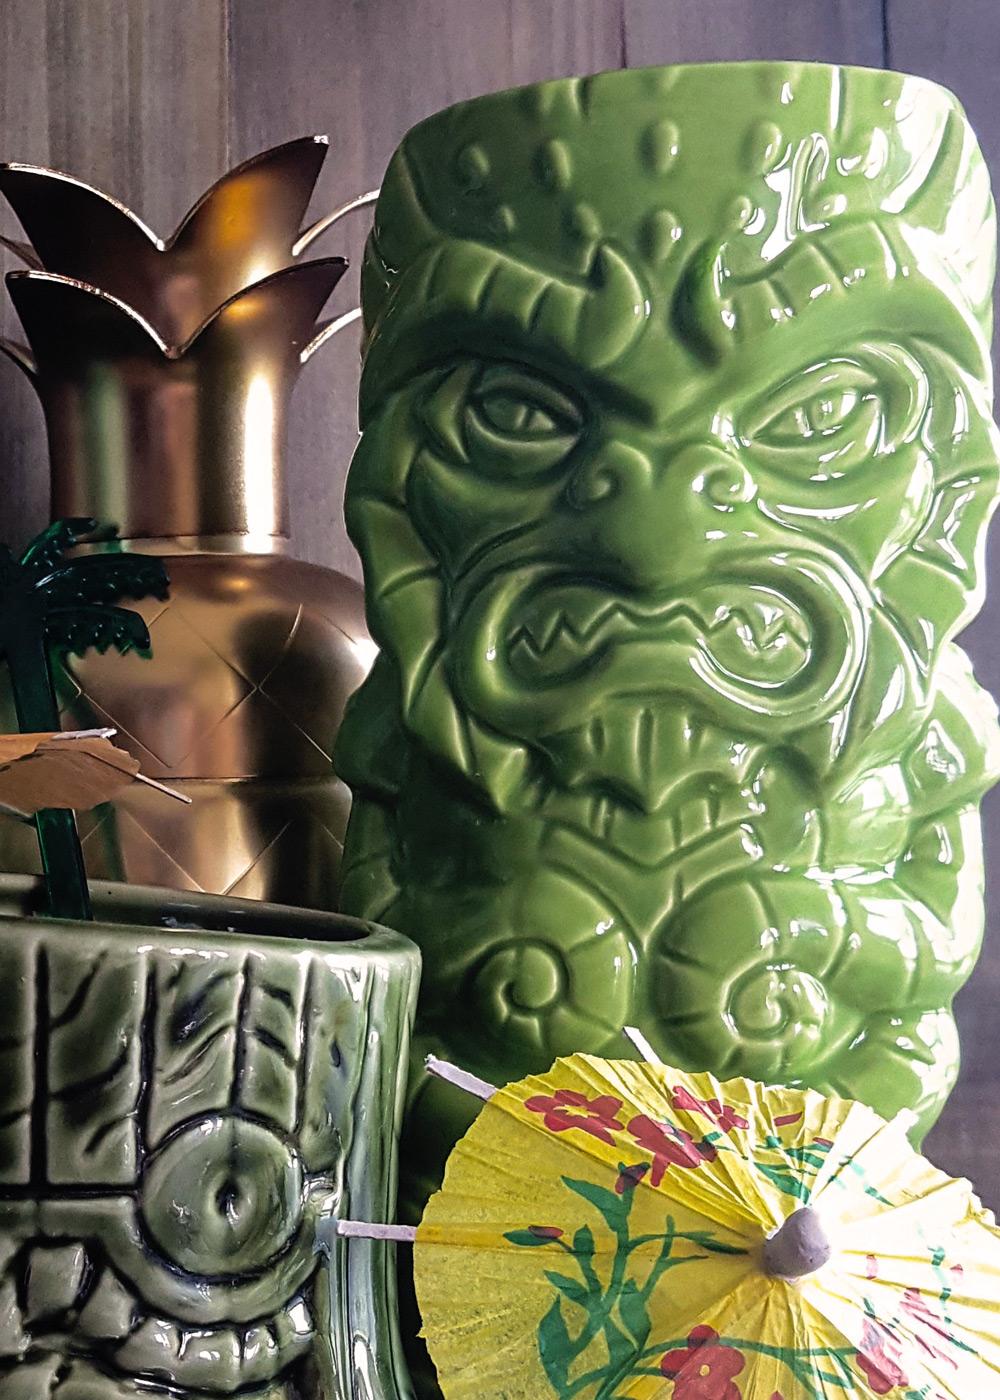 A close-up of a ceramic tiki mug in the shape of a kraken.